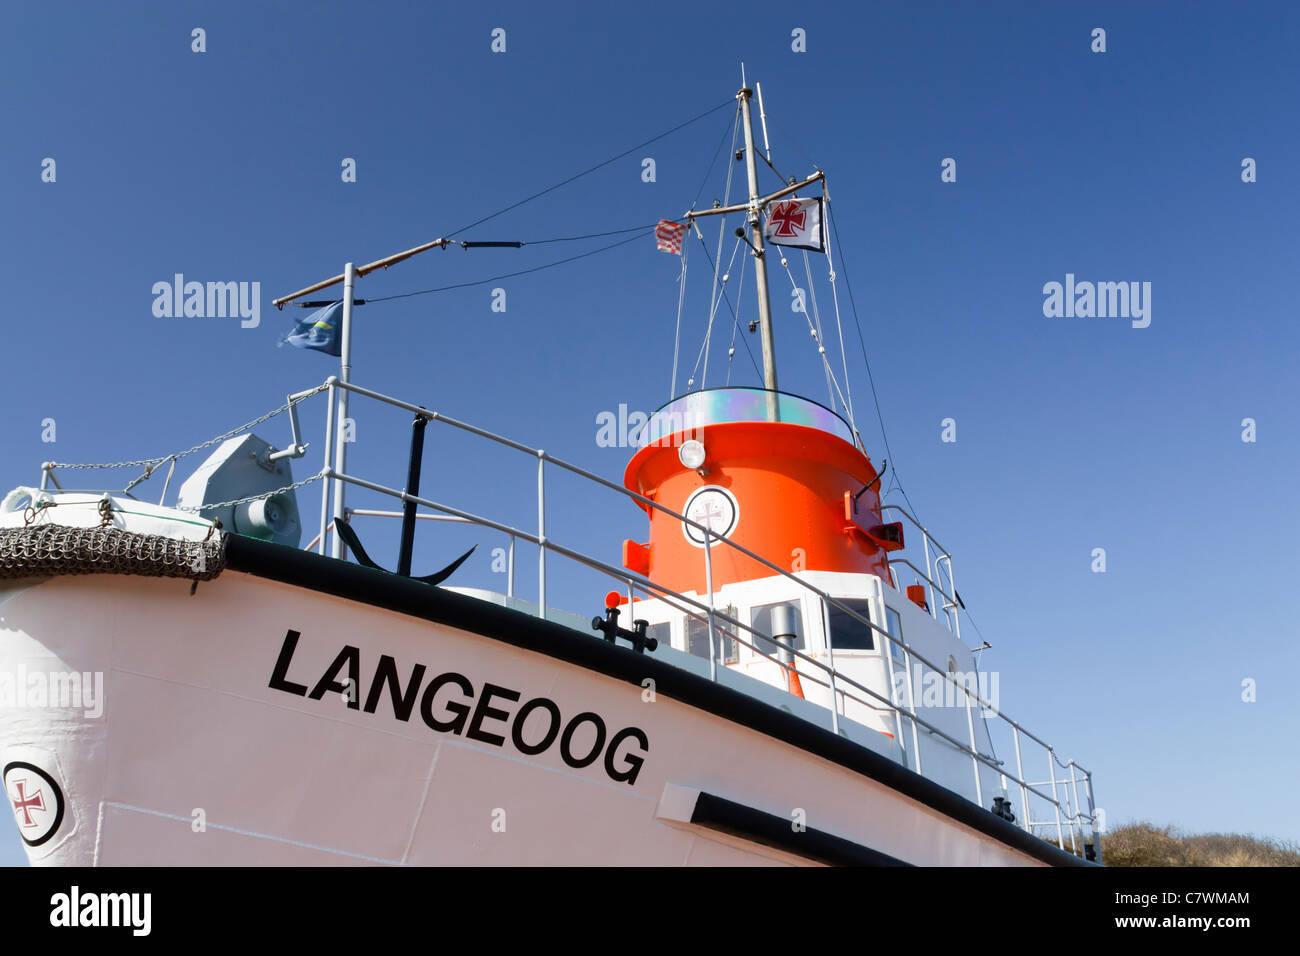 "Life boat ""Langeoog"" on the German East Frisian Island Langeoog. Stock Photo"